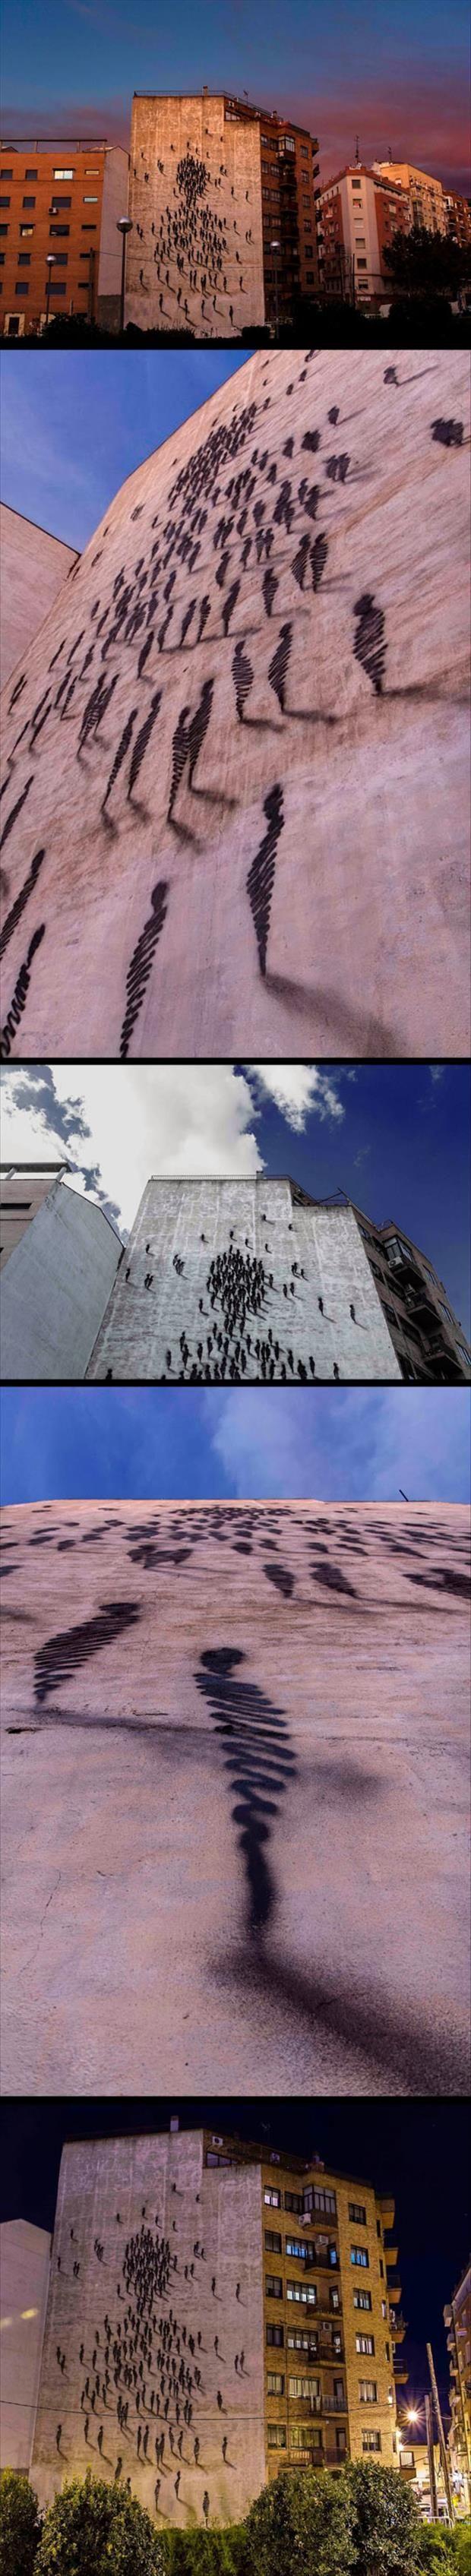 cool-urban-art-building-people-shadows